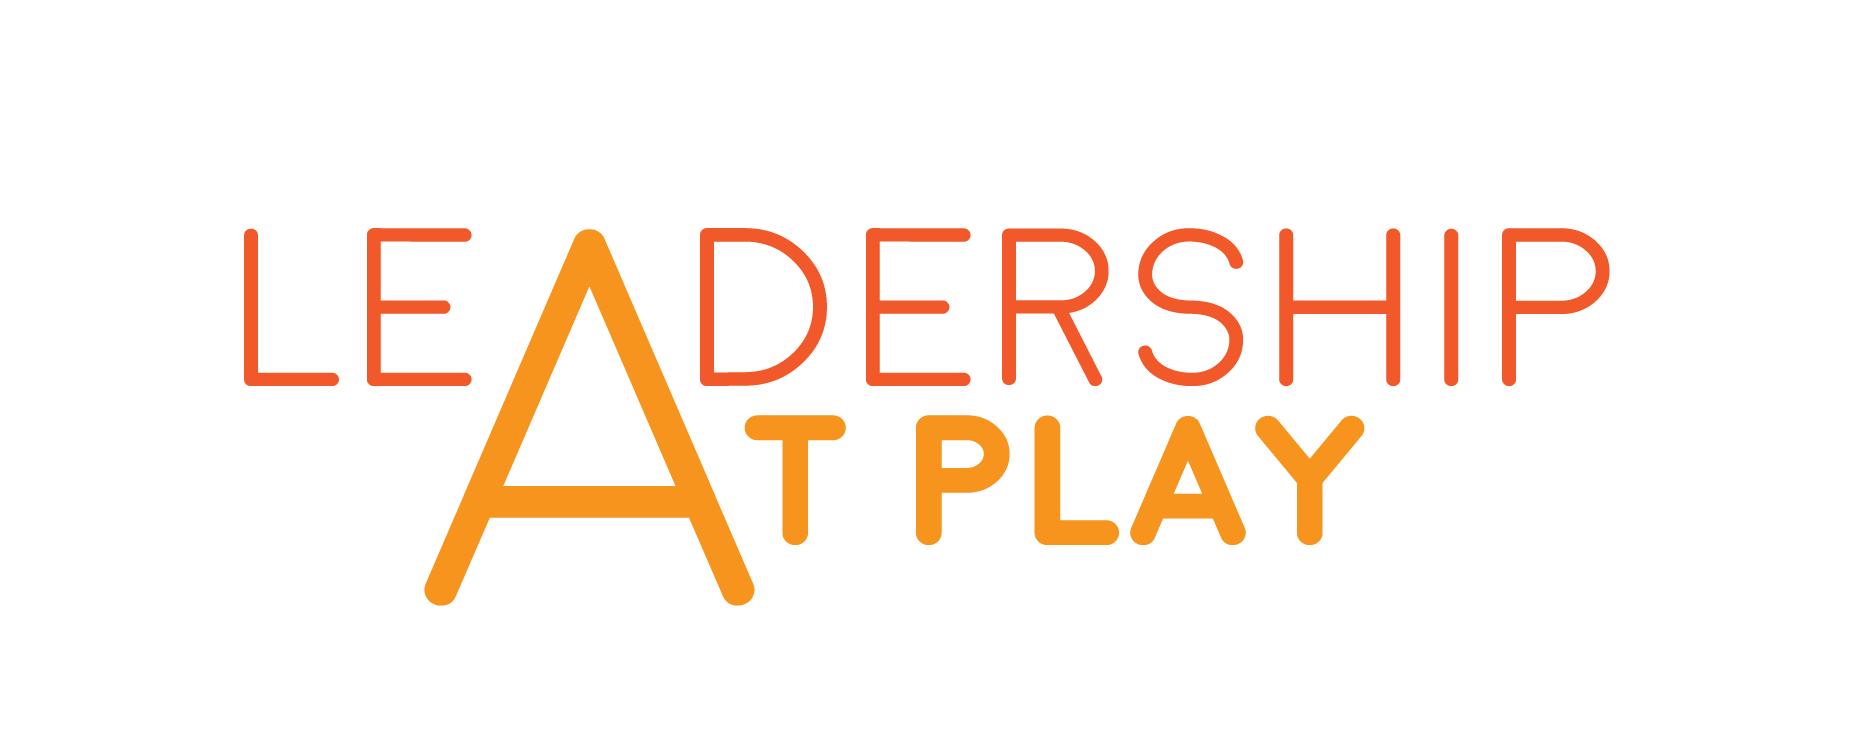 LeadershipATplay_Big A 1.png